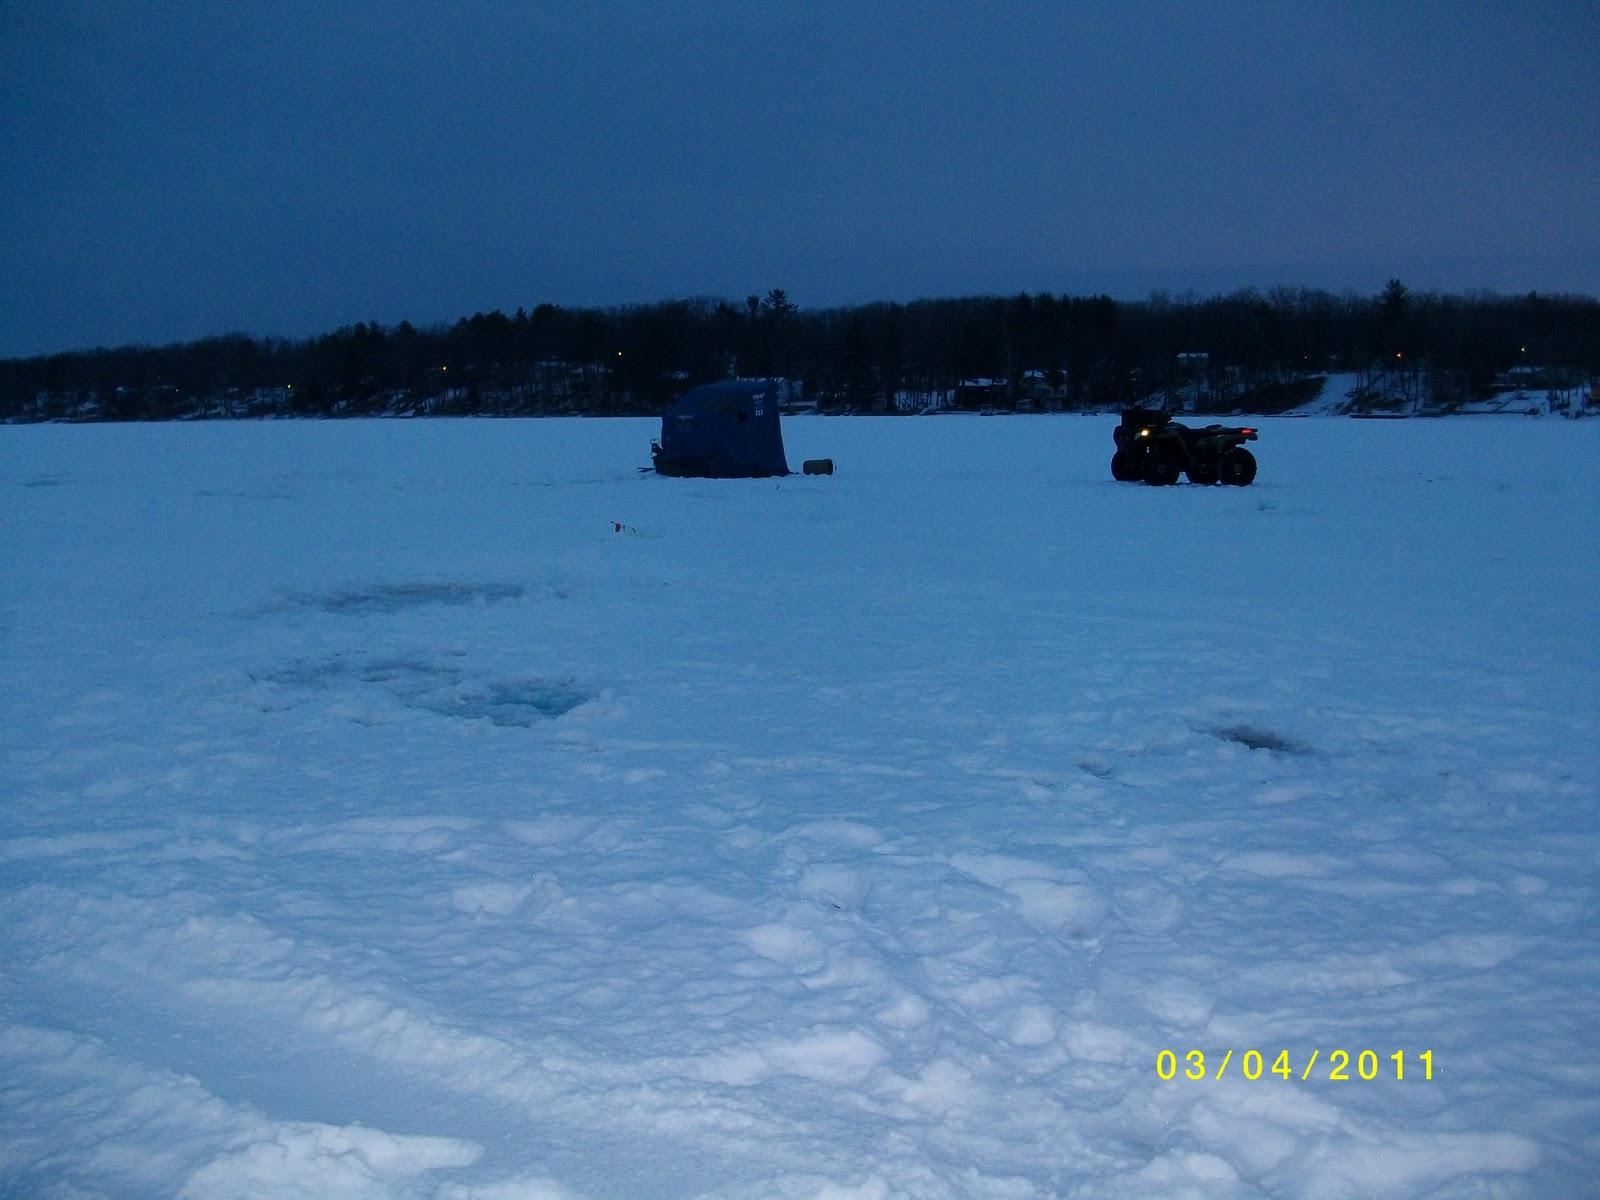 Houghton lake walleye report budd lake fishing report 3 4 11 for Enid lake fishing report